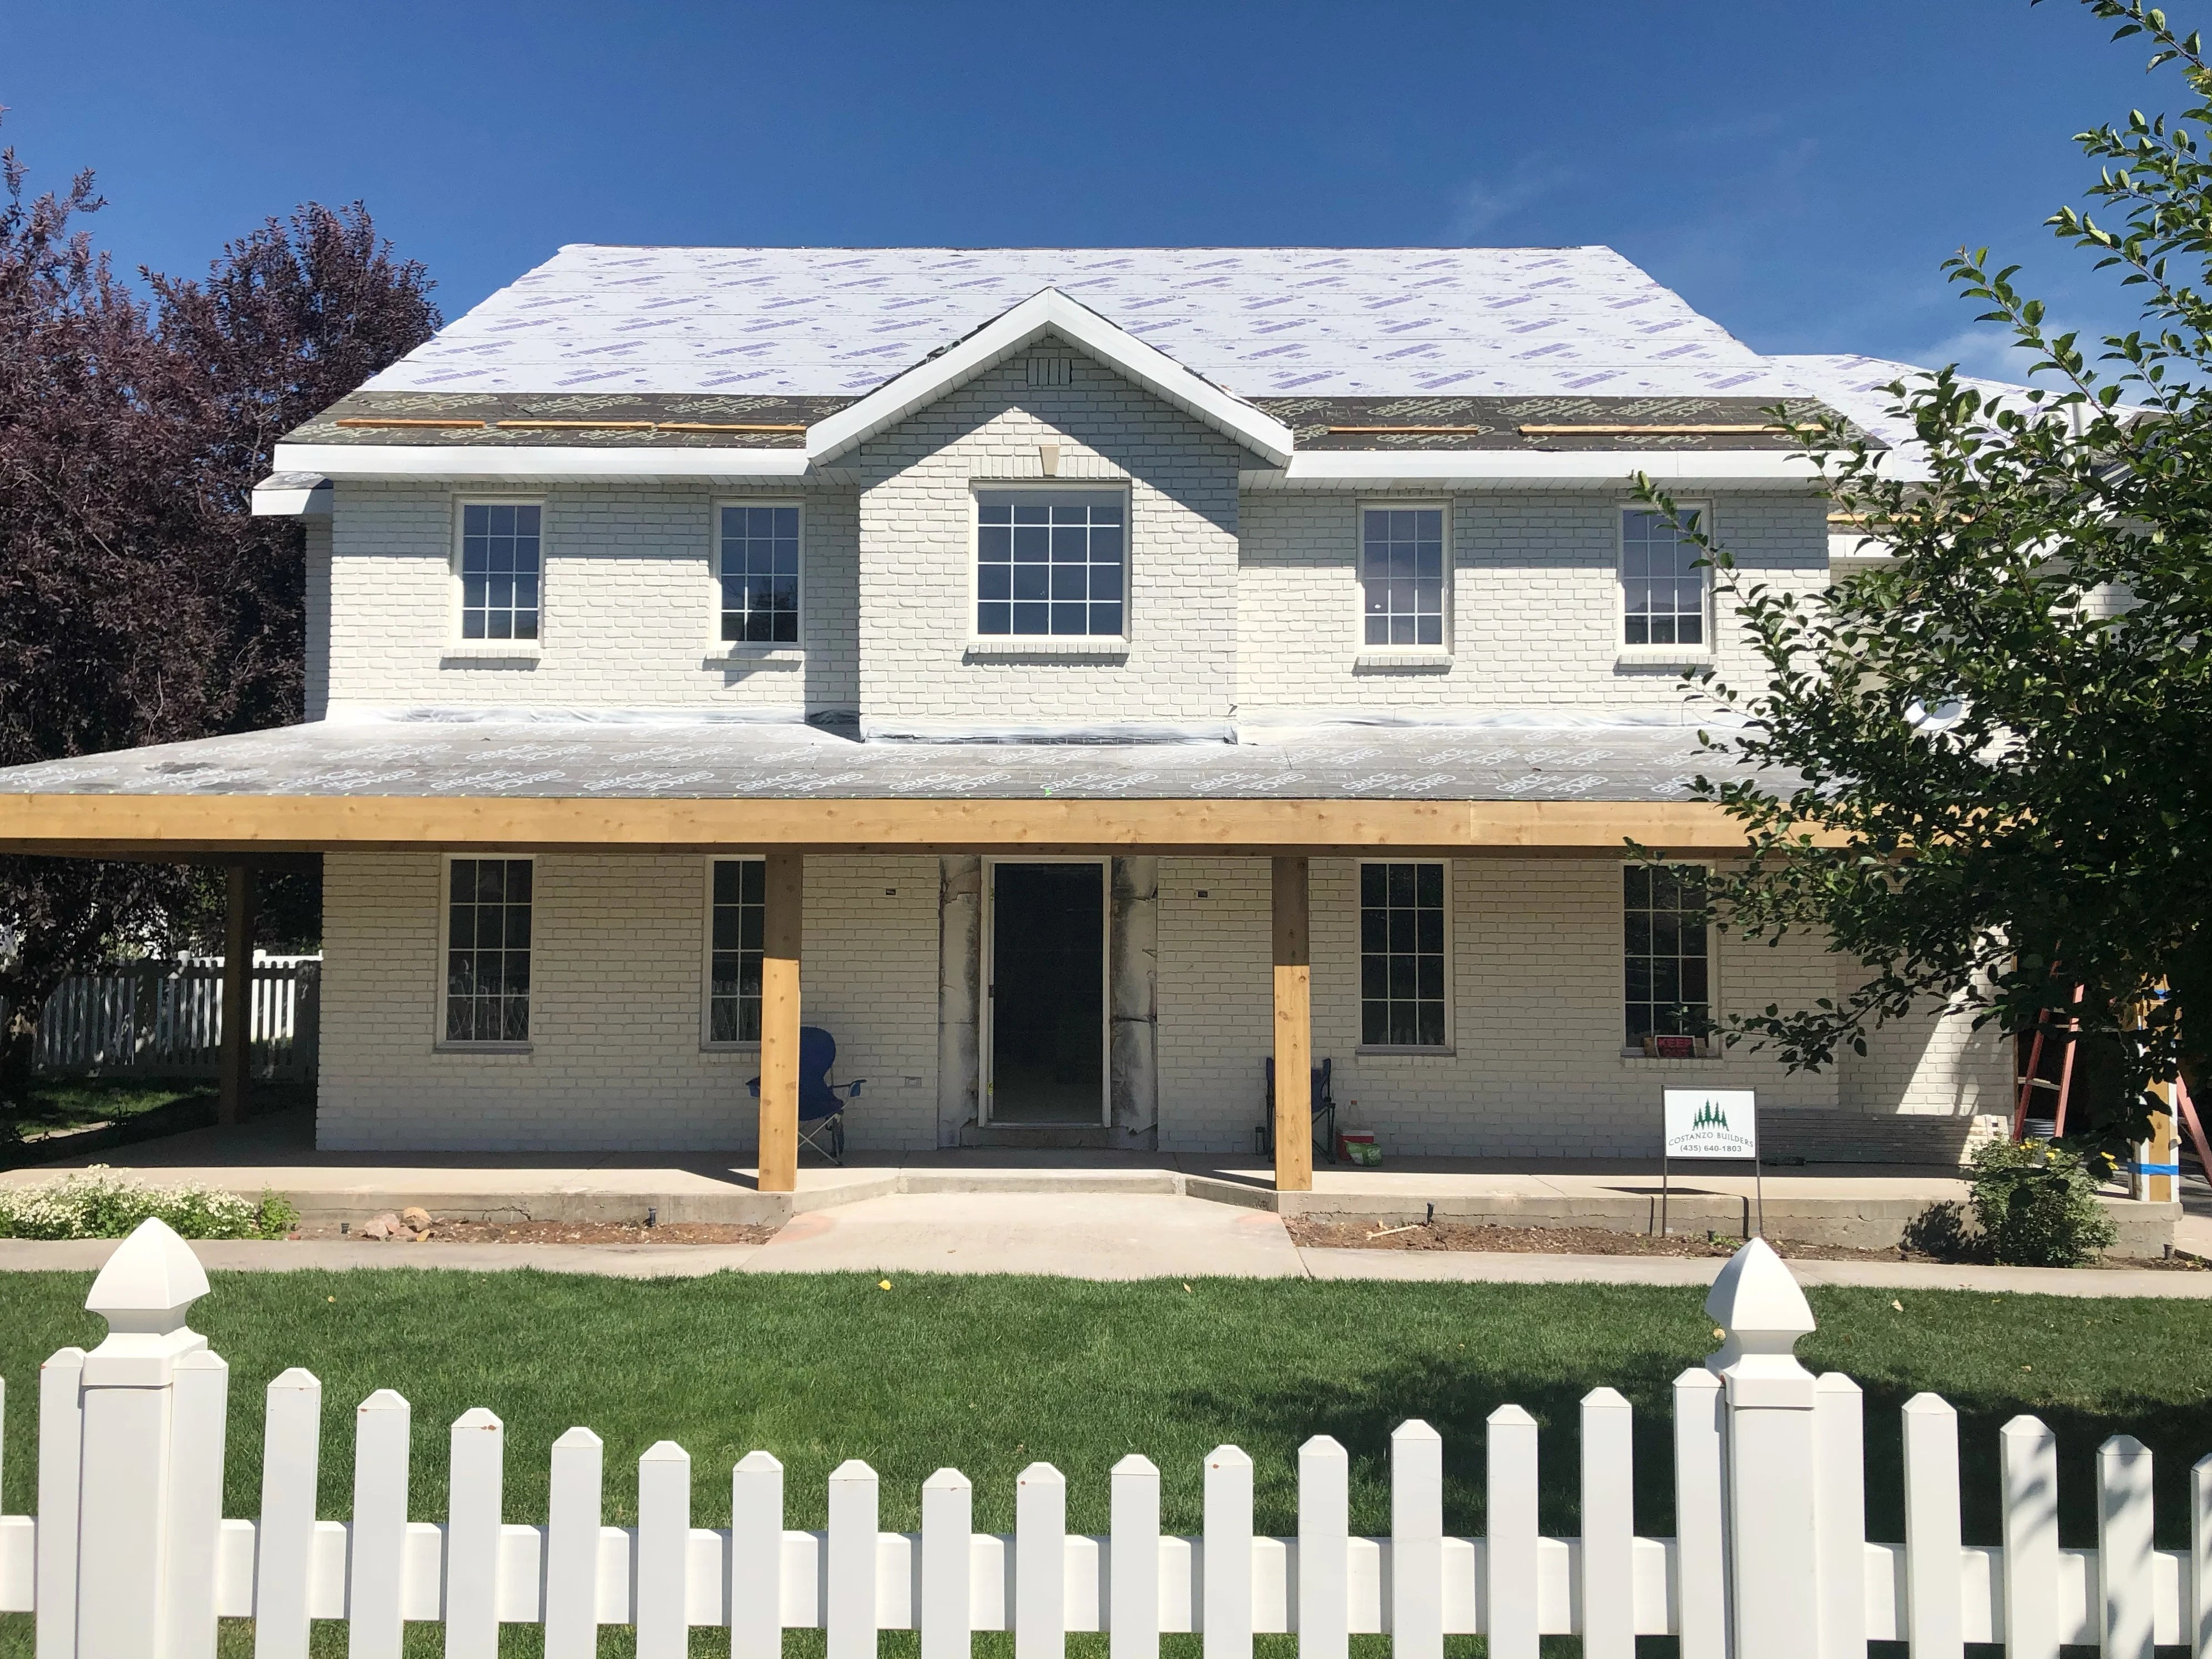 Midway Modern Farmhouse Plans with Wrap Around Porch